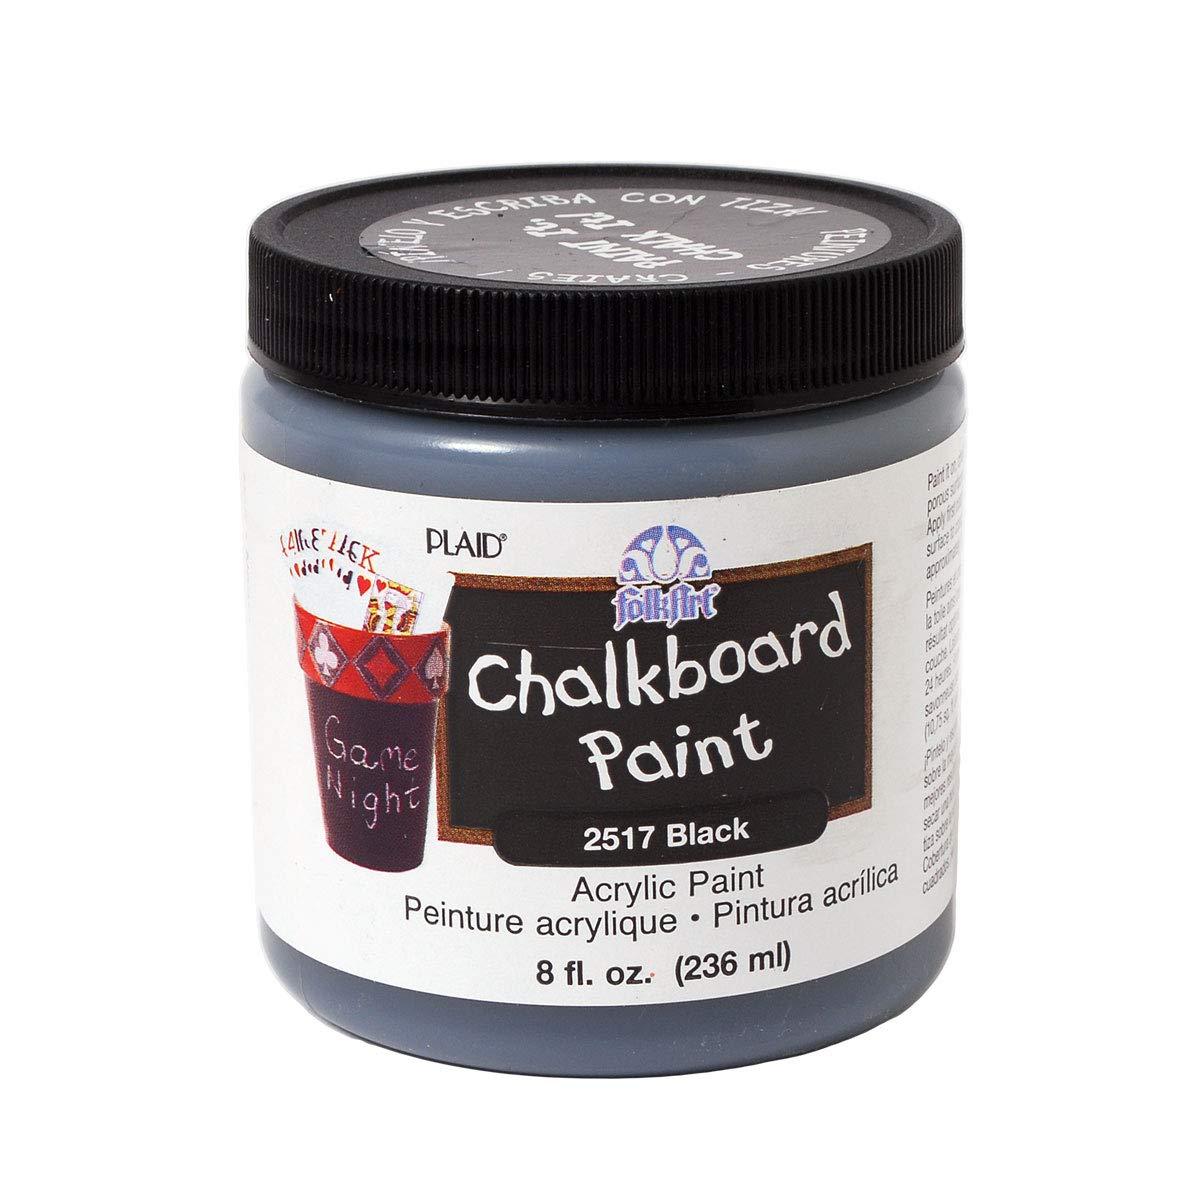 FolkArt Chalkboard Paint in Assorted Colors (8-Ounce), 2517 Black